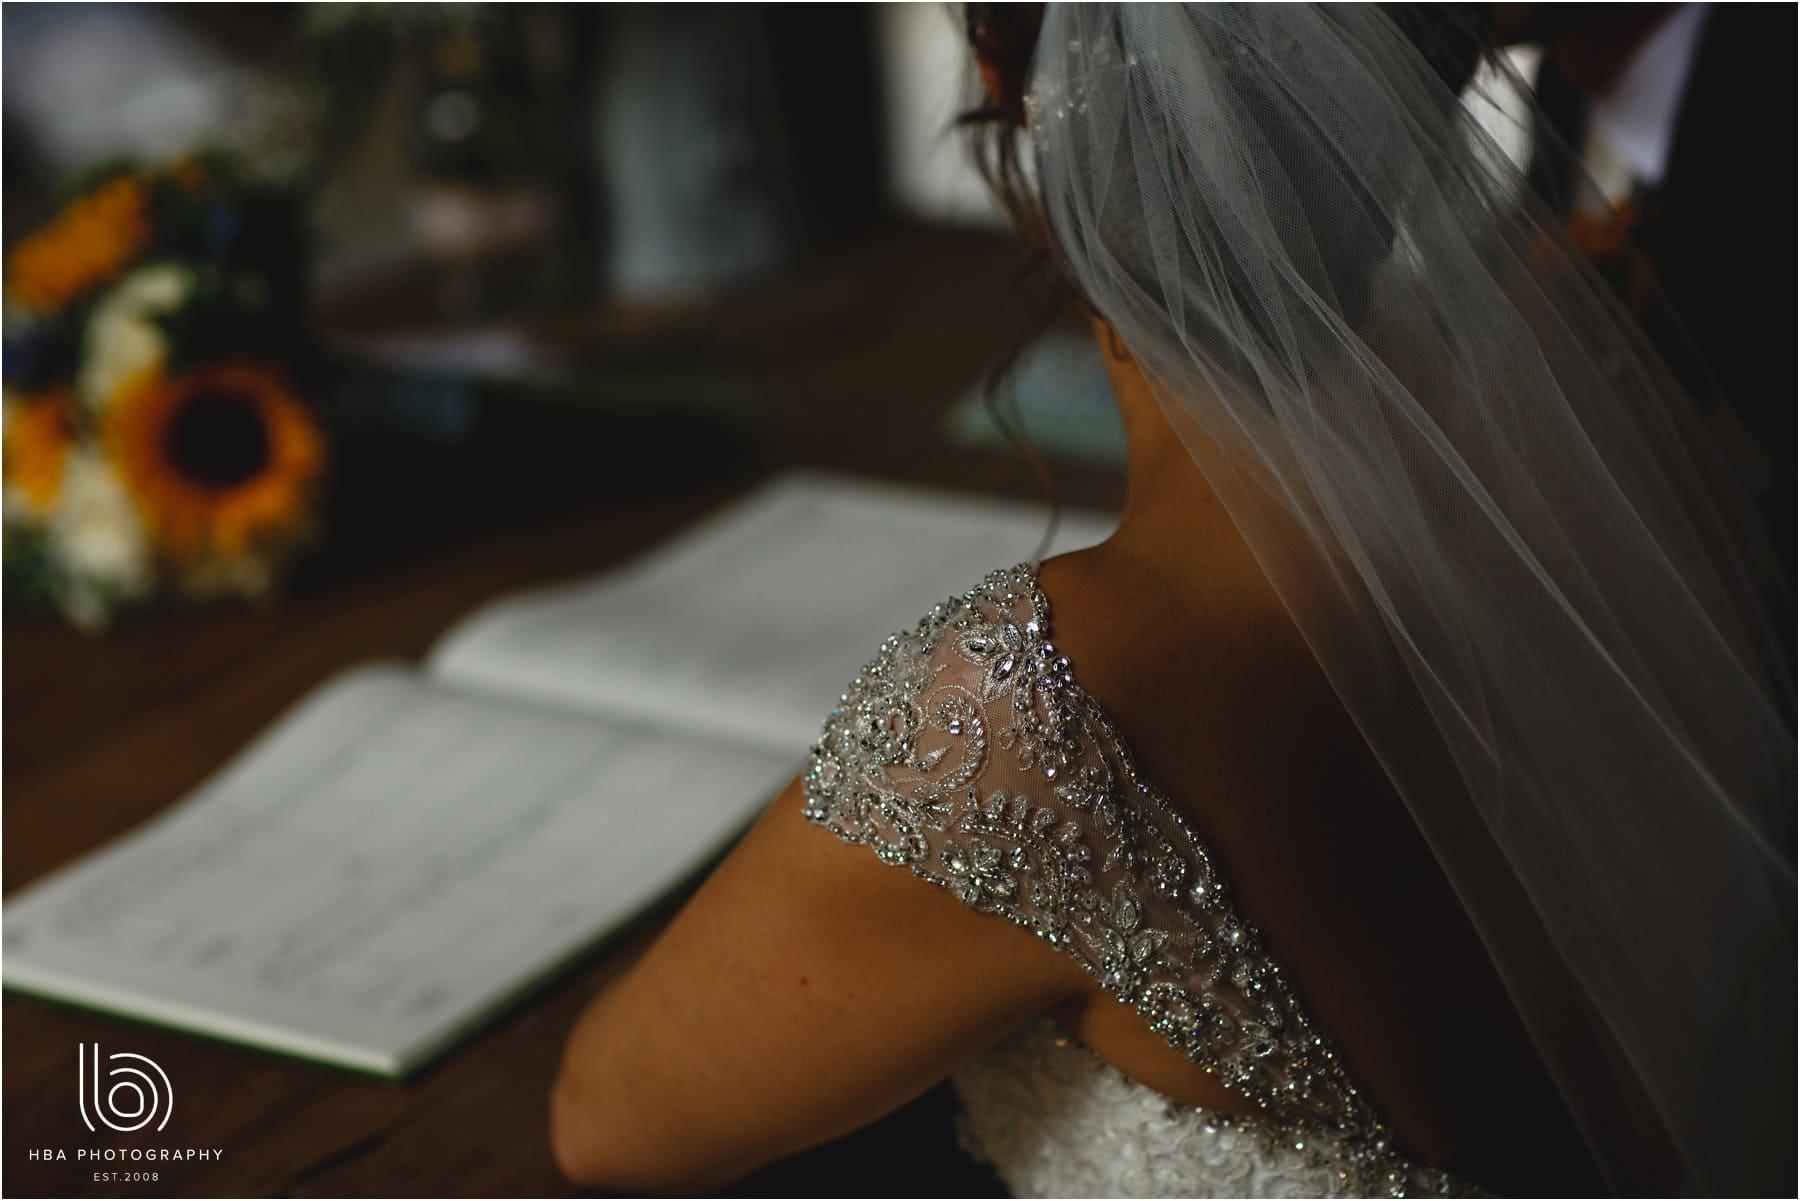 the shoulder detail on the bride's dress